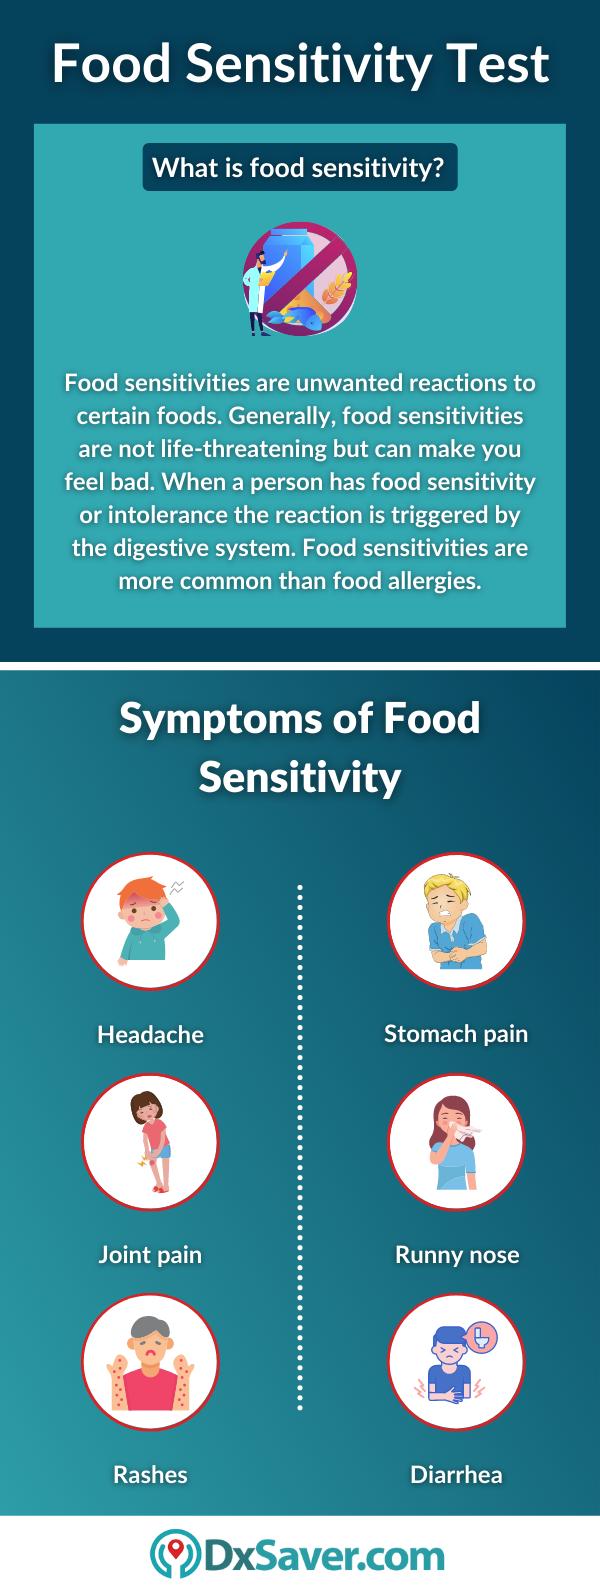 Food Sensitivity and Symptoms